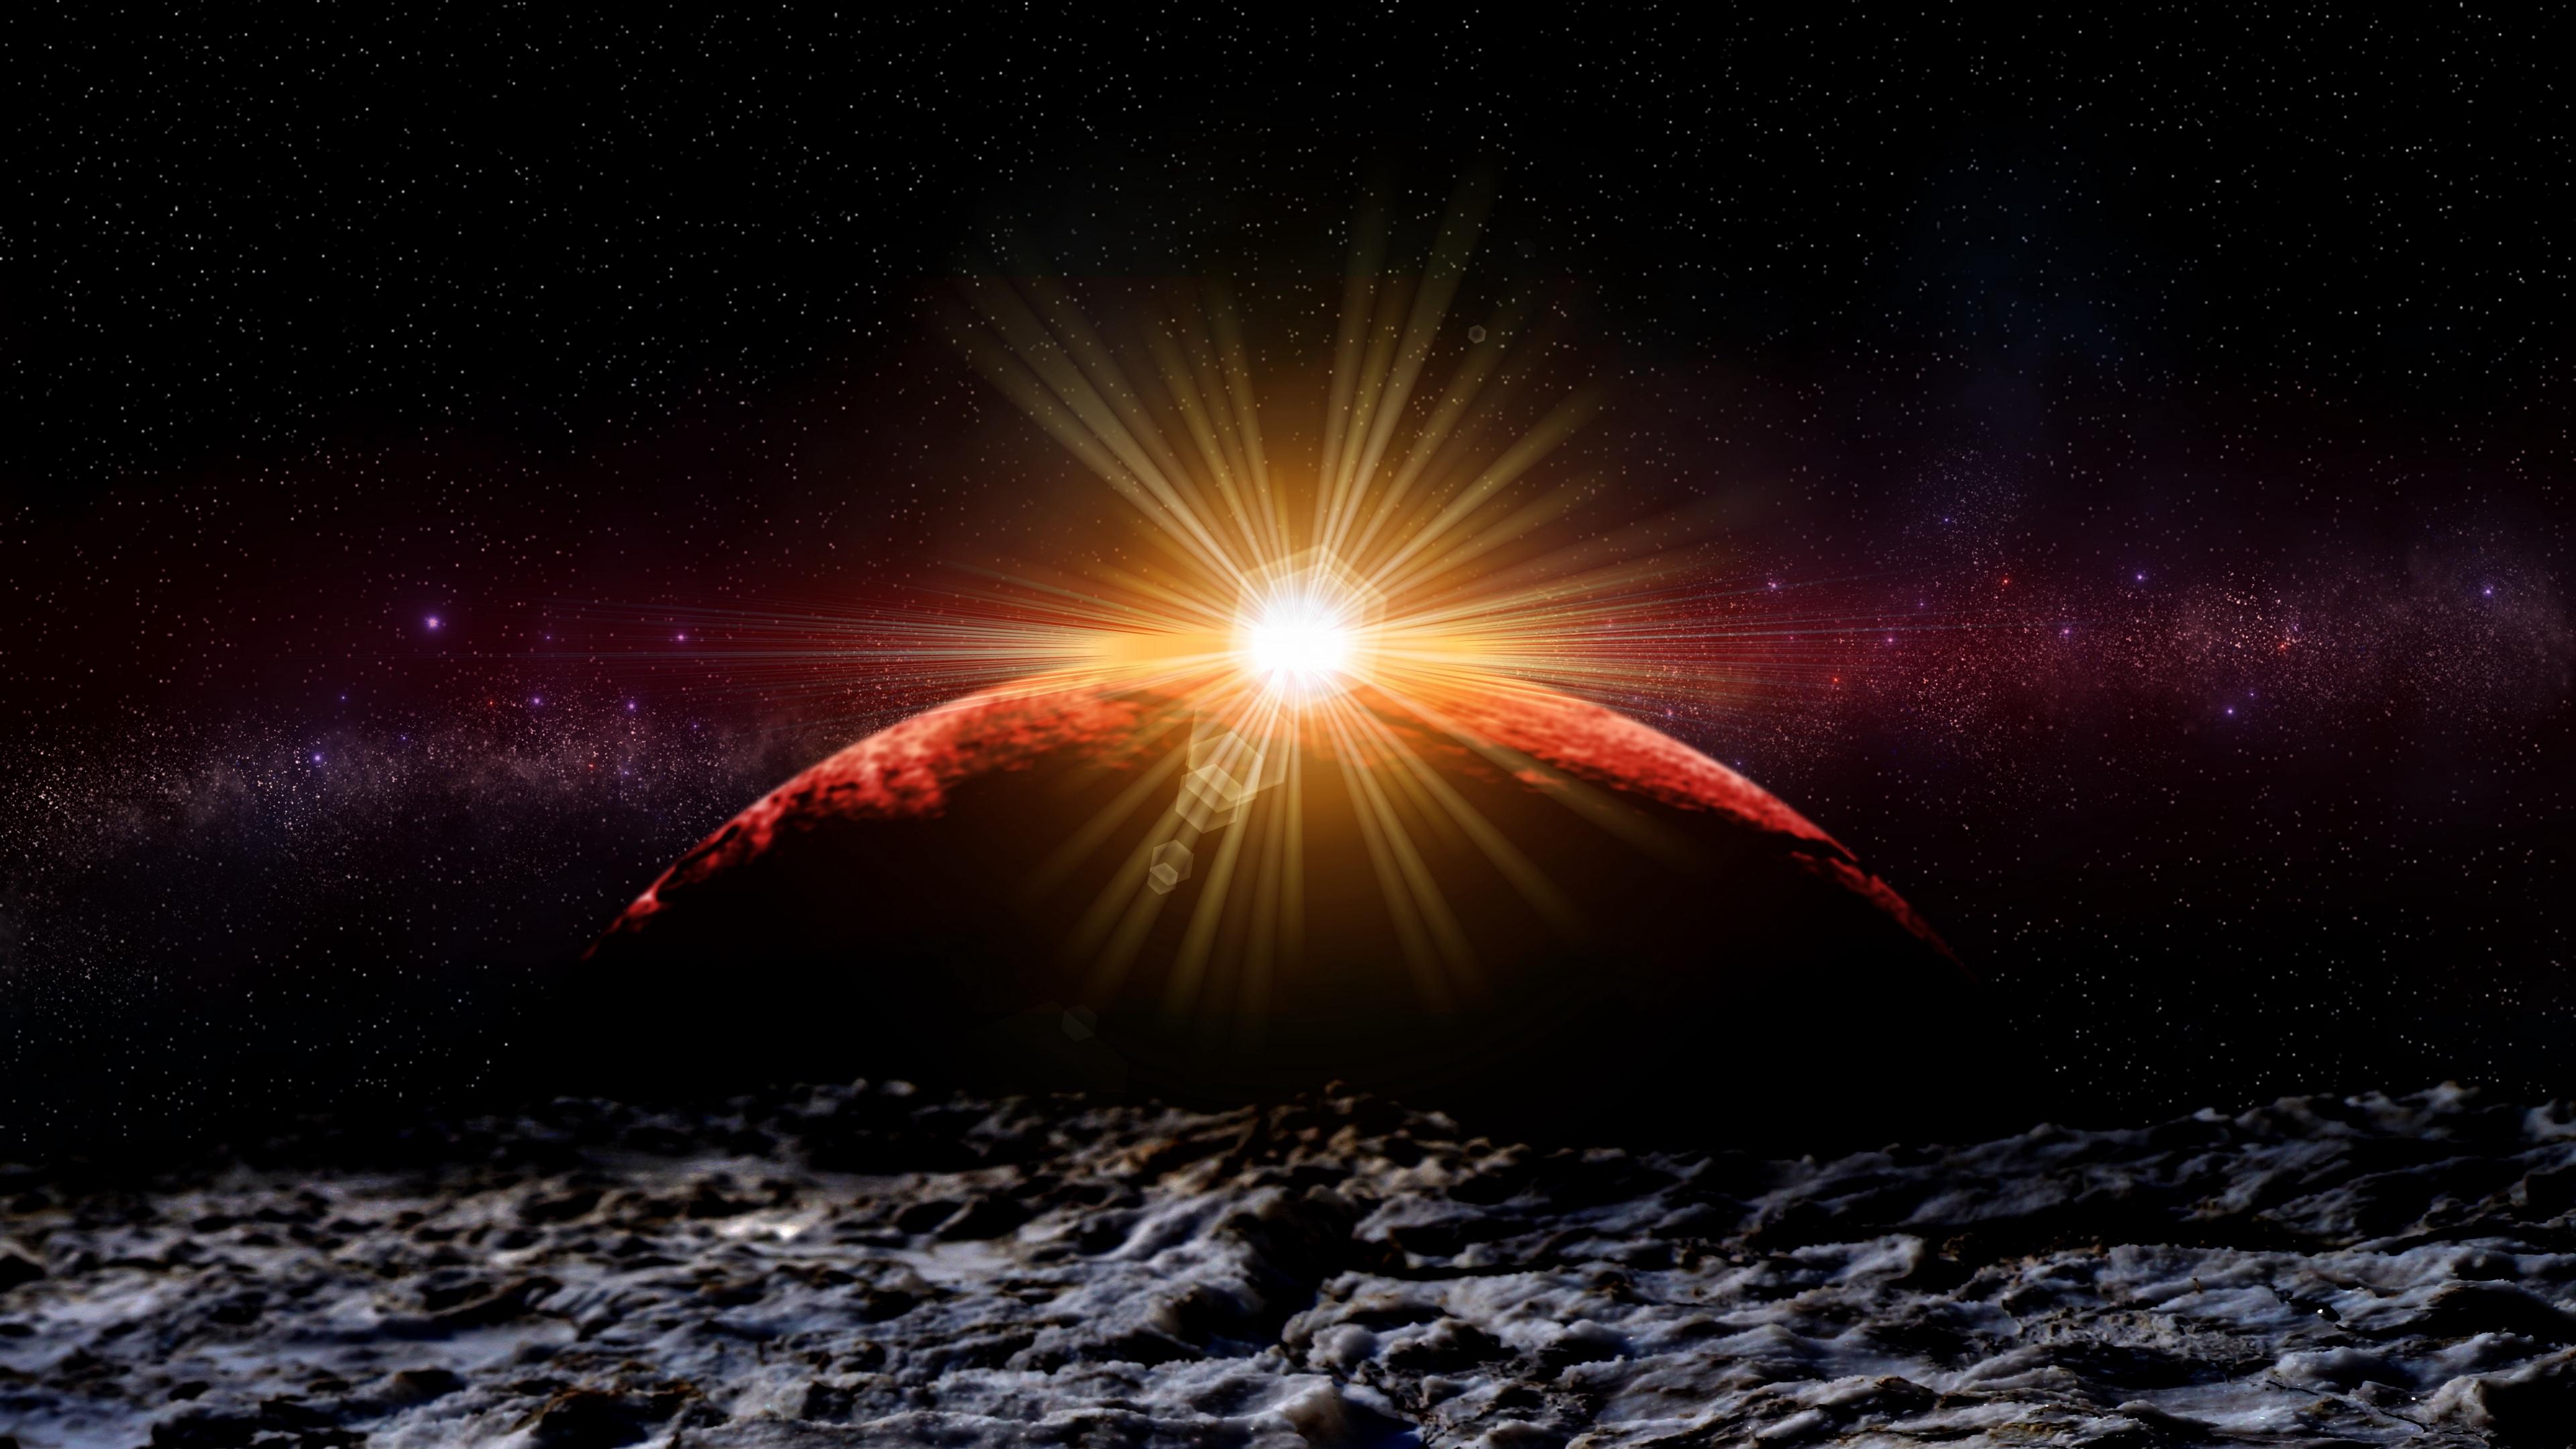 planet eclipse photoshop stars galaxy universe 4k 1536016182 - planet, eclipse, photoshop, stars, galaxy, universe 4k - Planet, photoshop, Eclipse